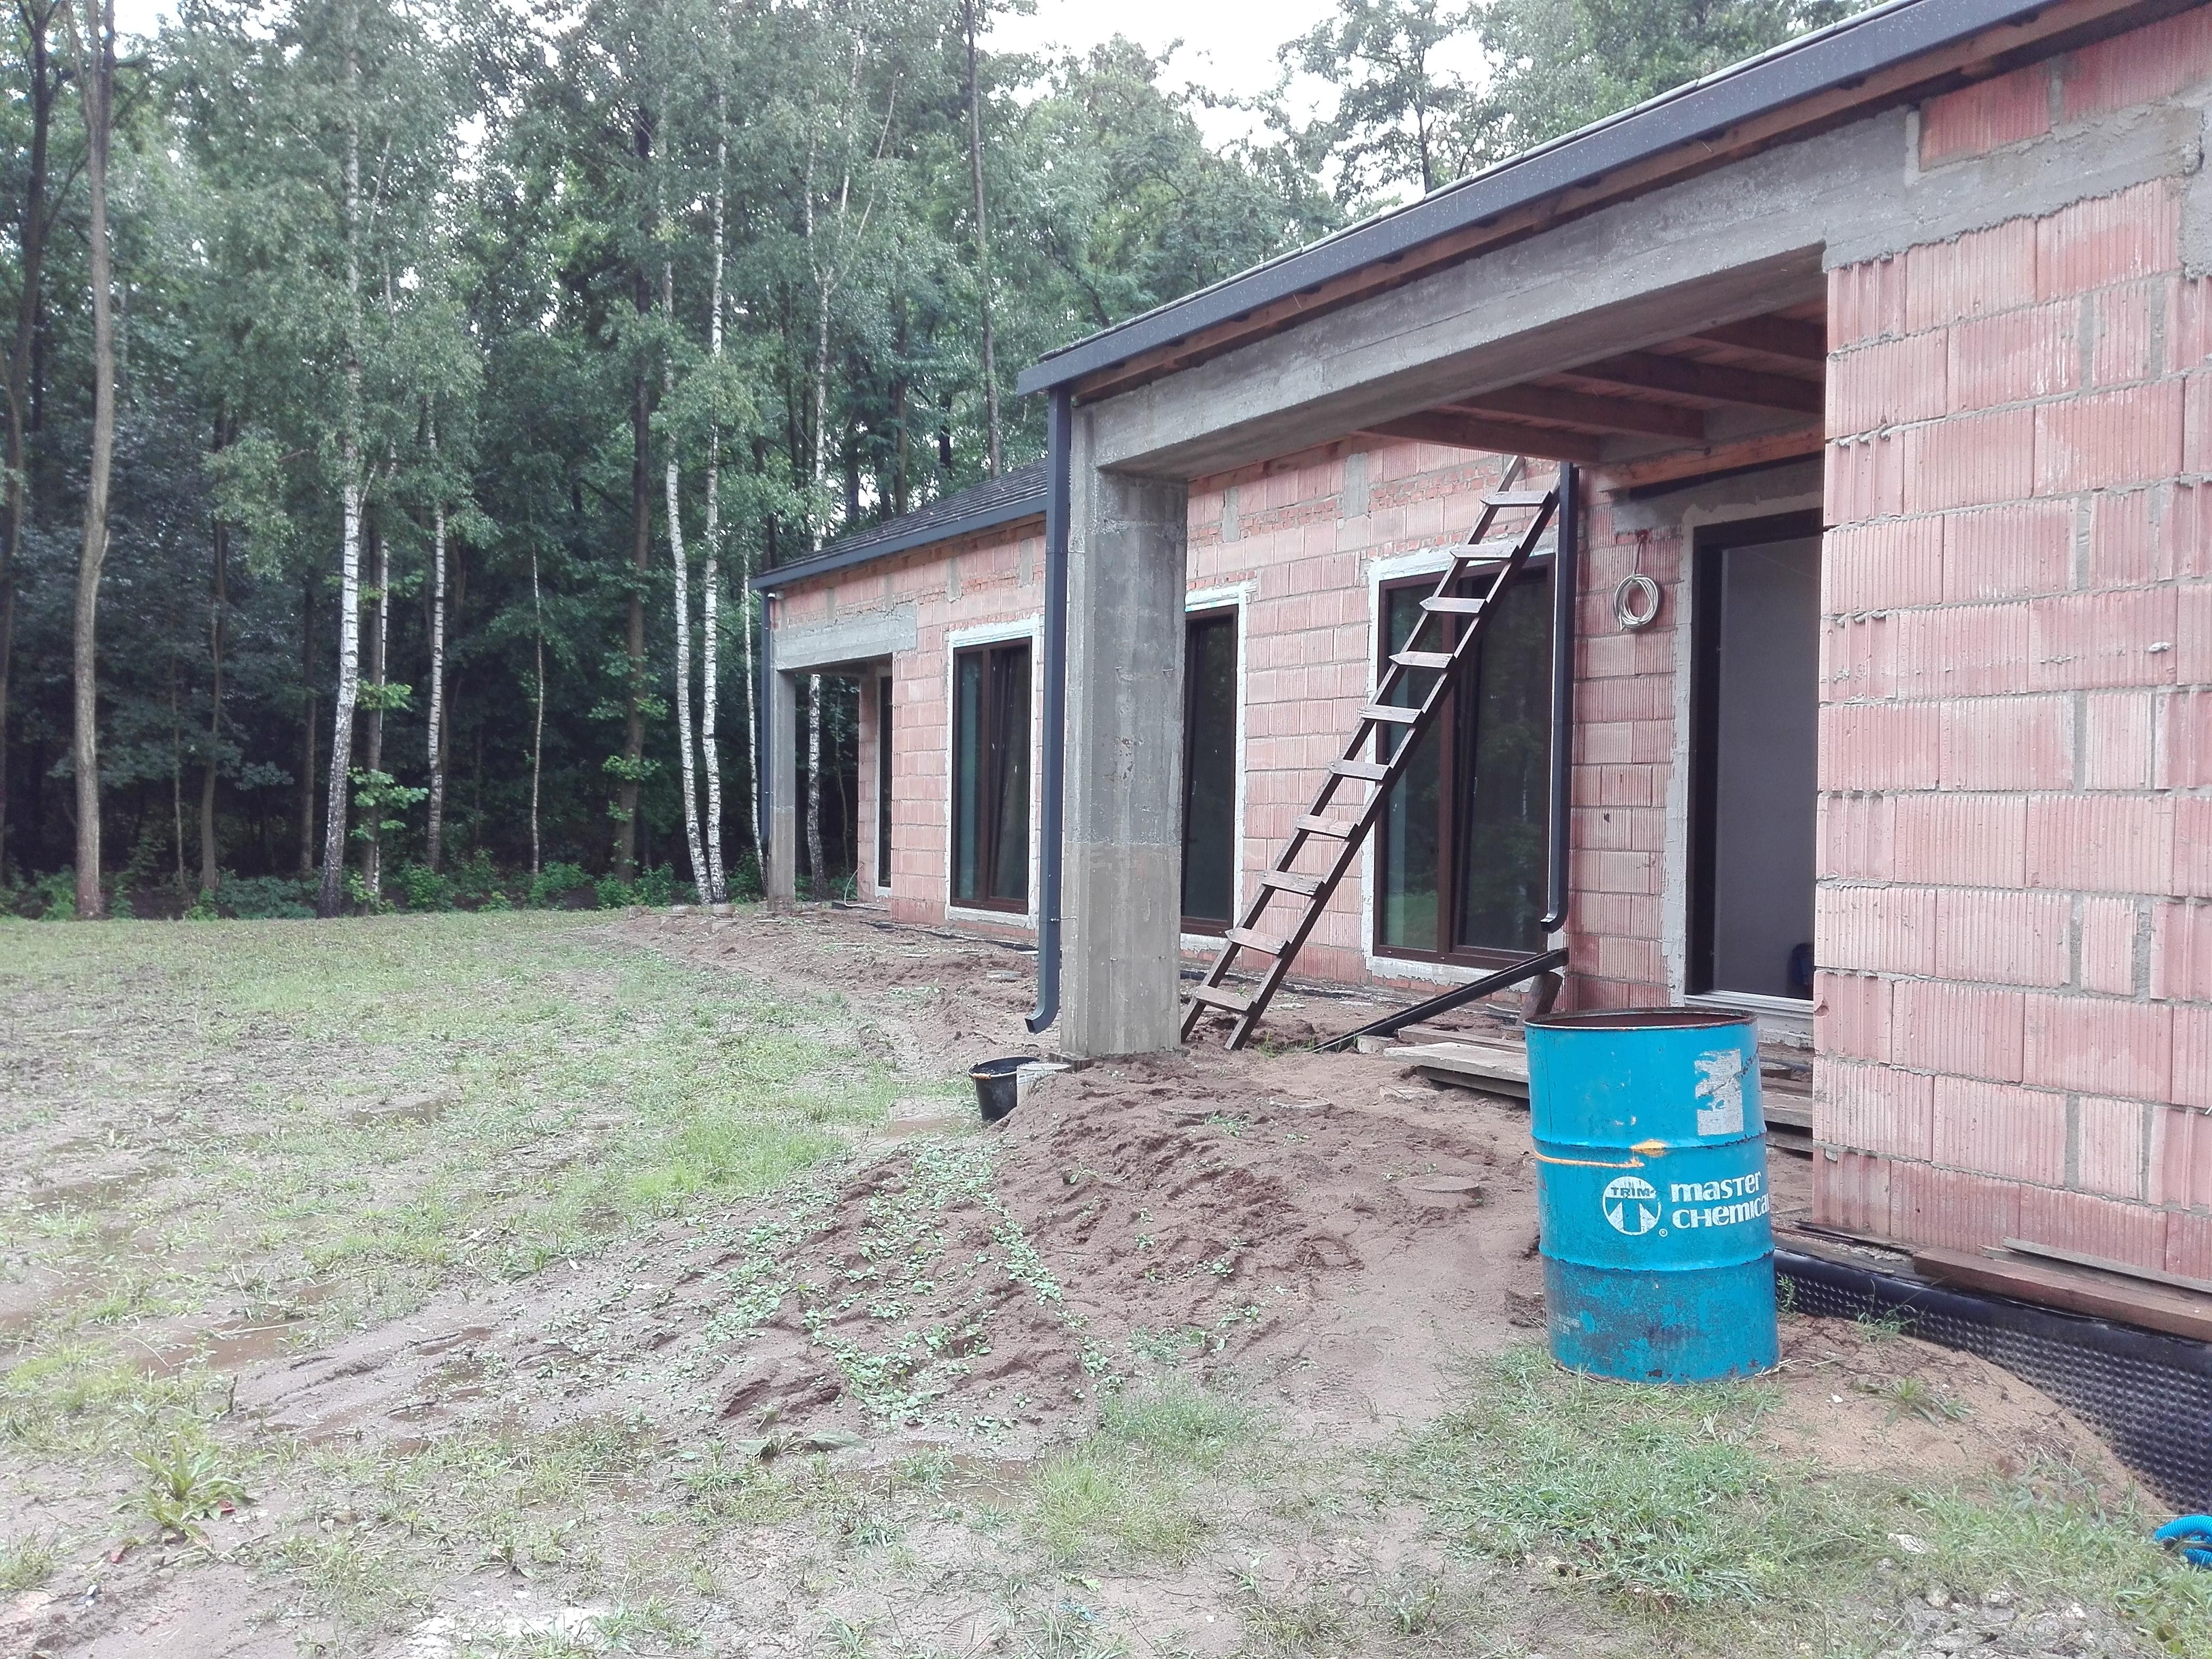 Monitoring domu i posesji - Monitoring i alarmy sandomierz tarnobrzeg. Satel Hikvision